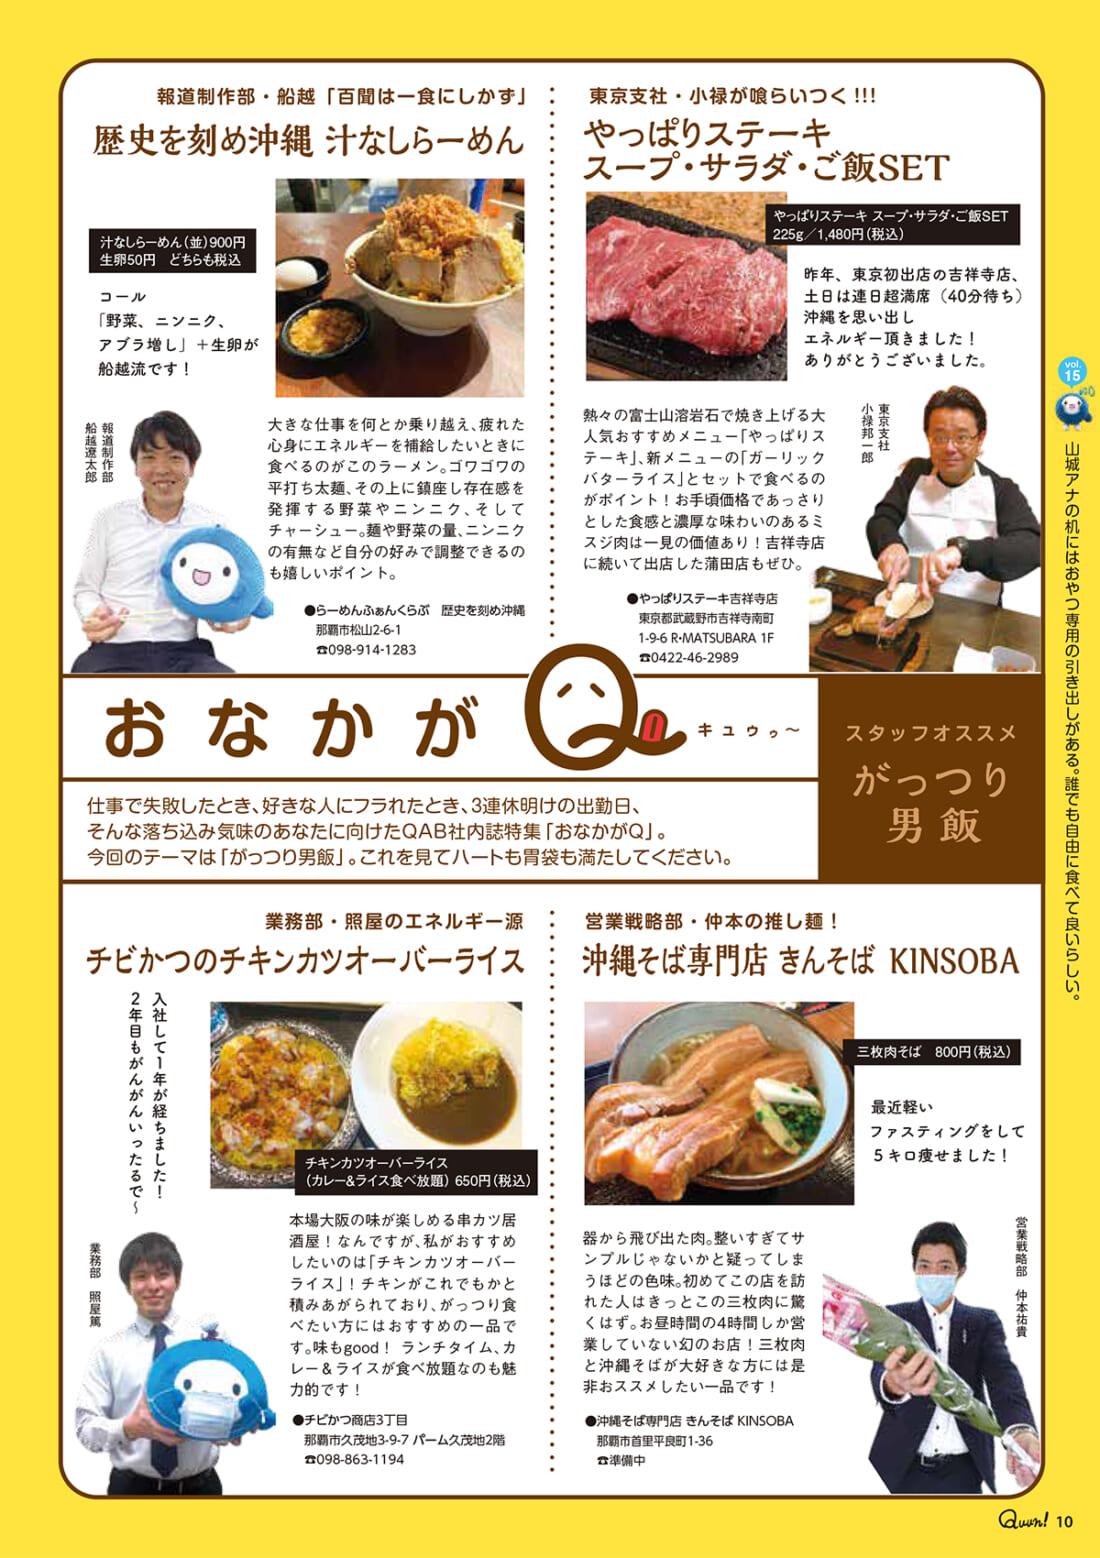 https://www.qab.co.jp/qgoro/wp-content/uploads/quun_1512-1100x1558.jpg